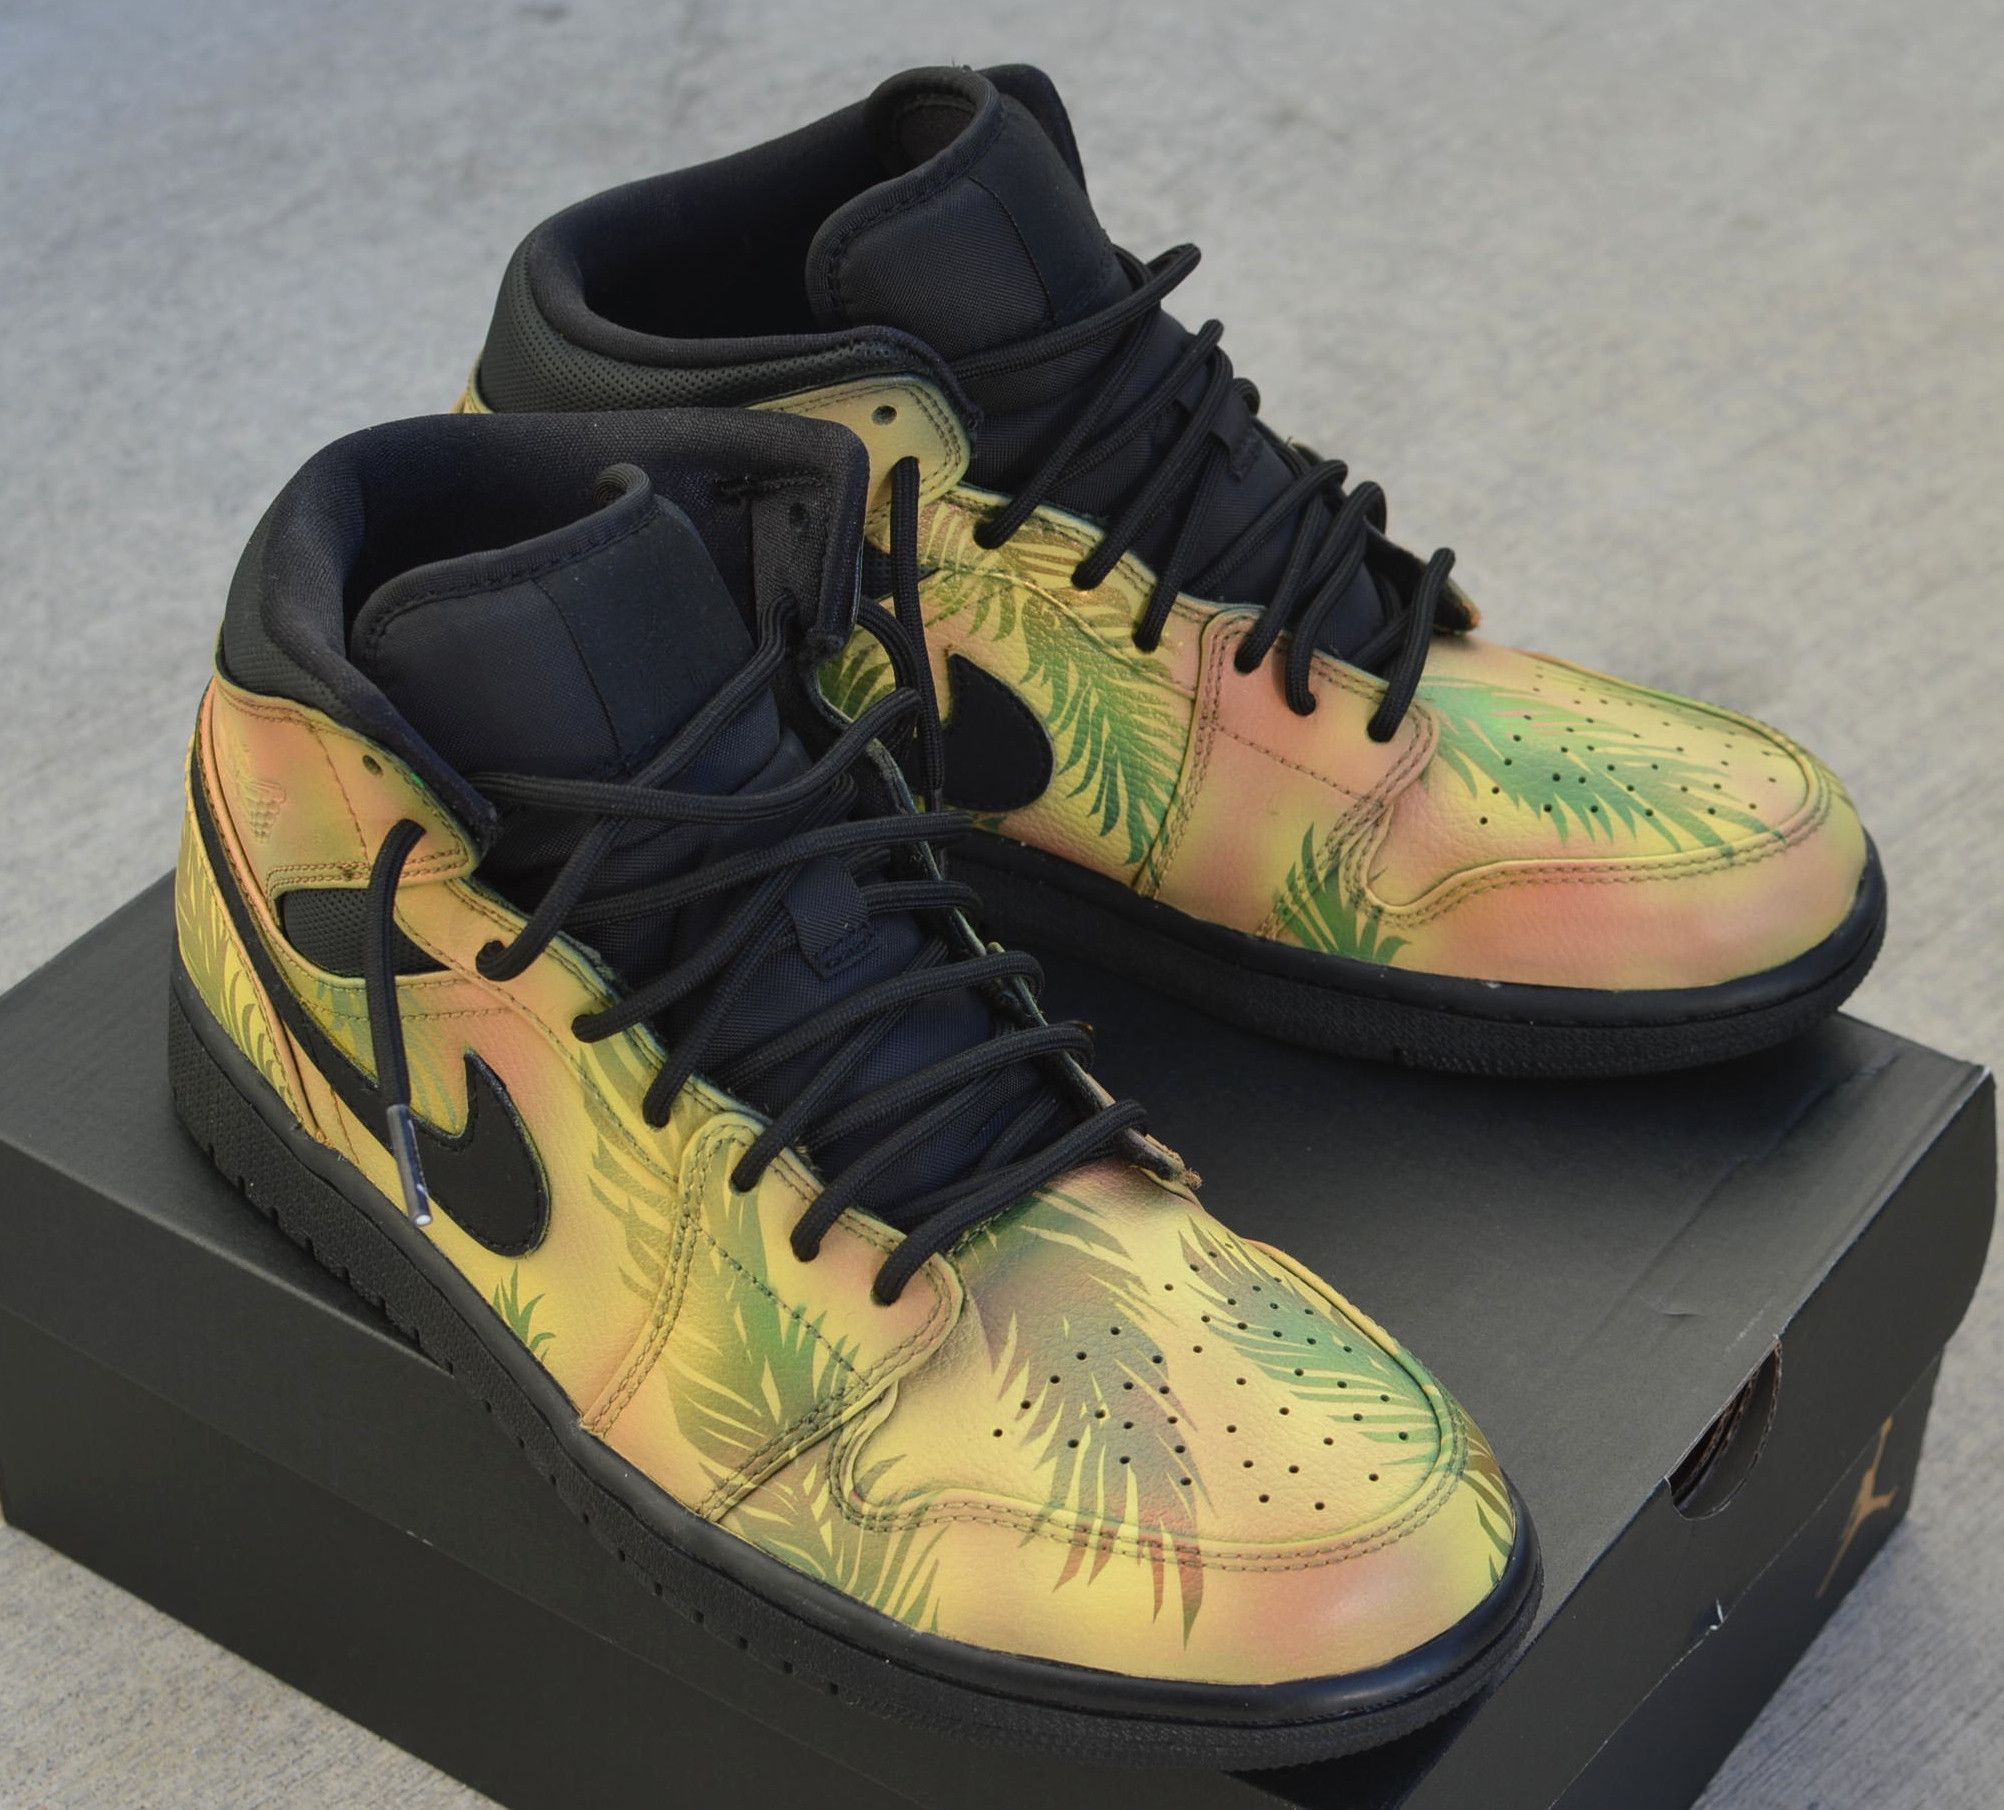 detailed look f1dd0 8c921 Tropical Floral Nike AJ1 Retro - Hand Painted Jordans